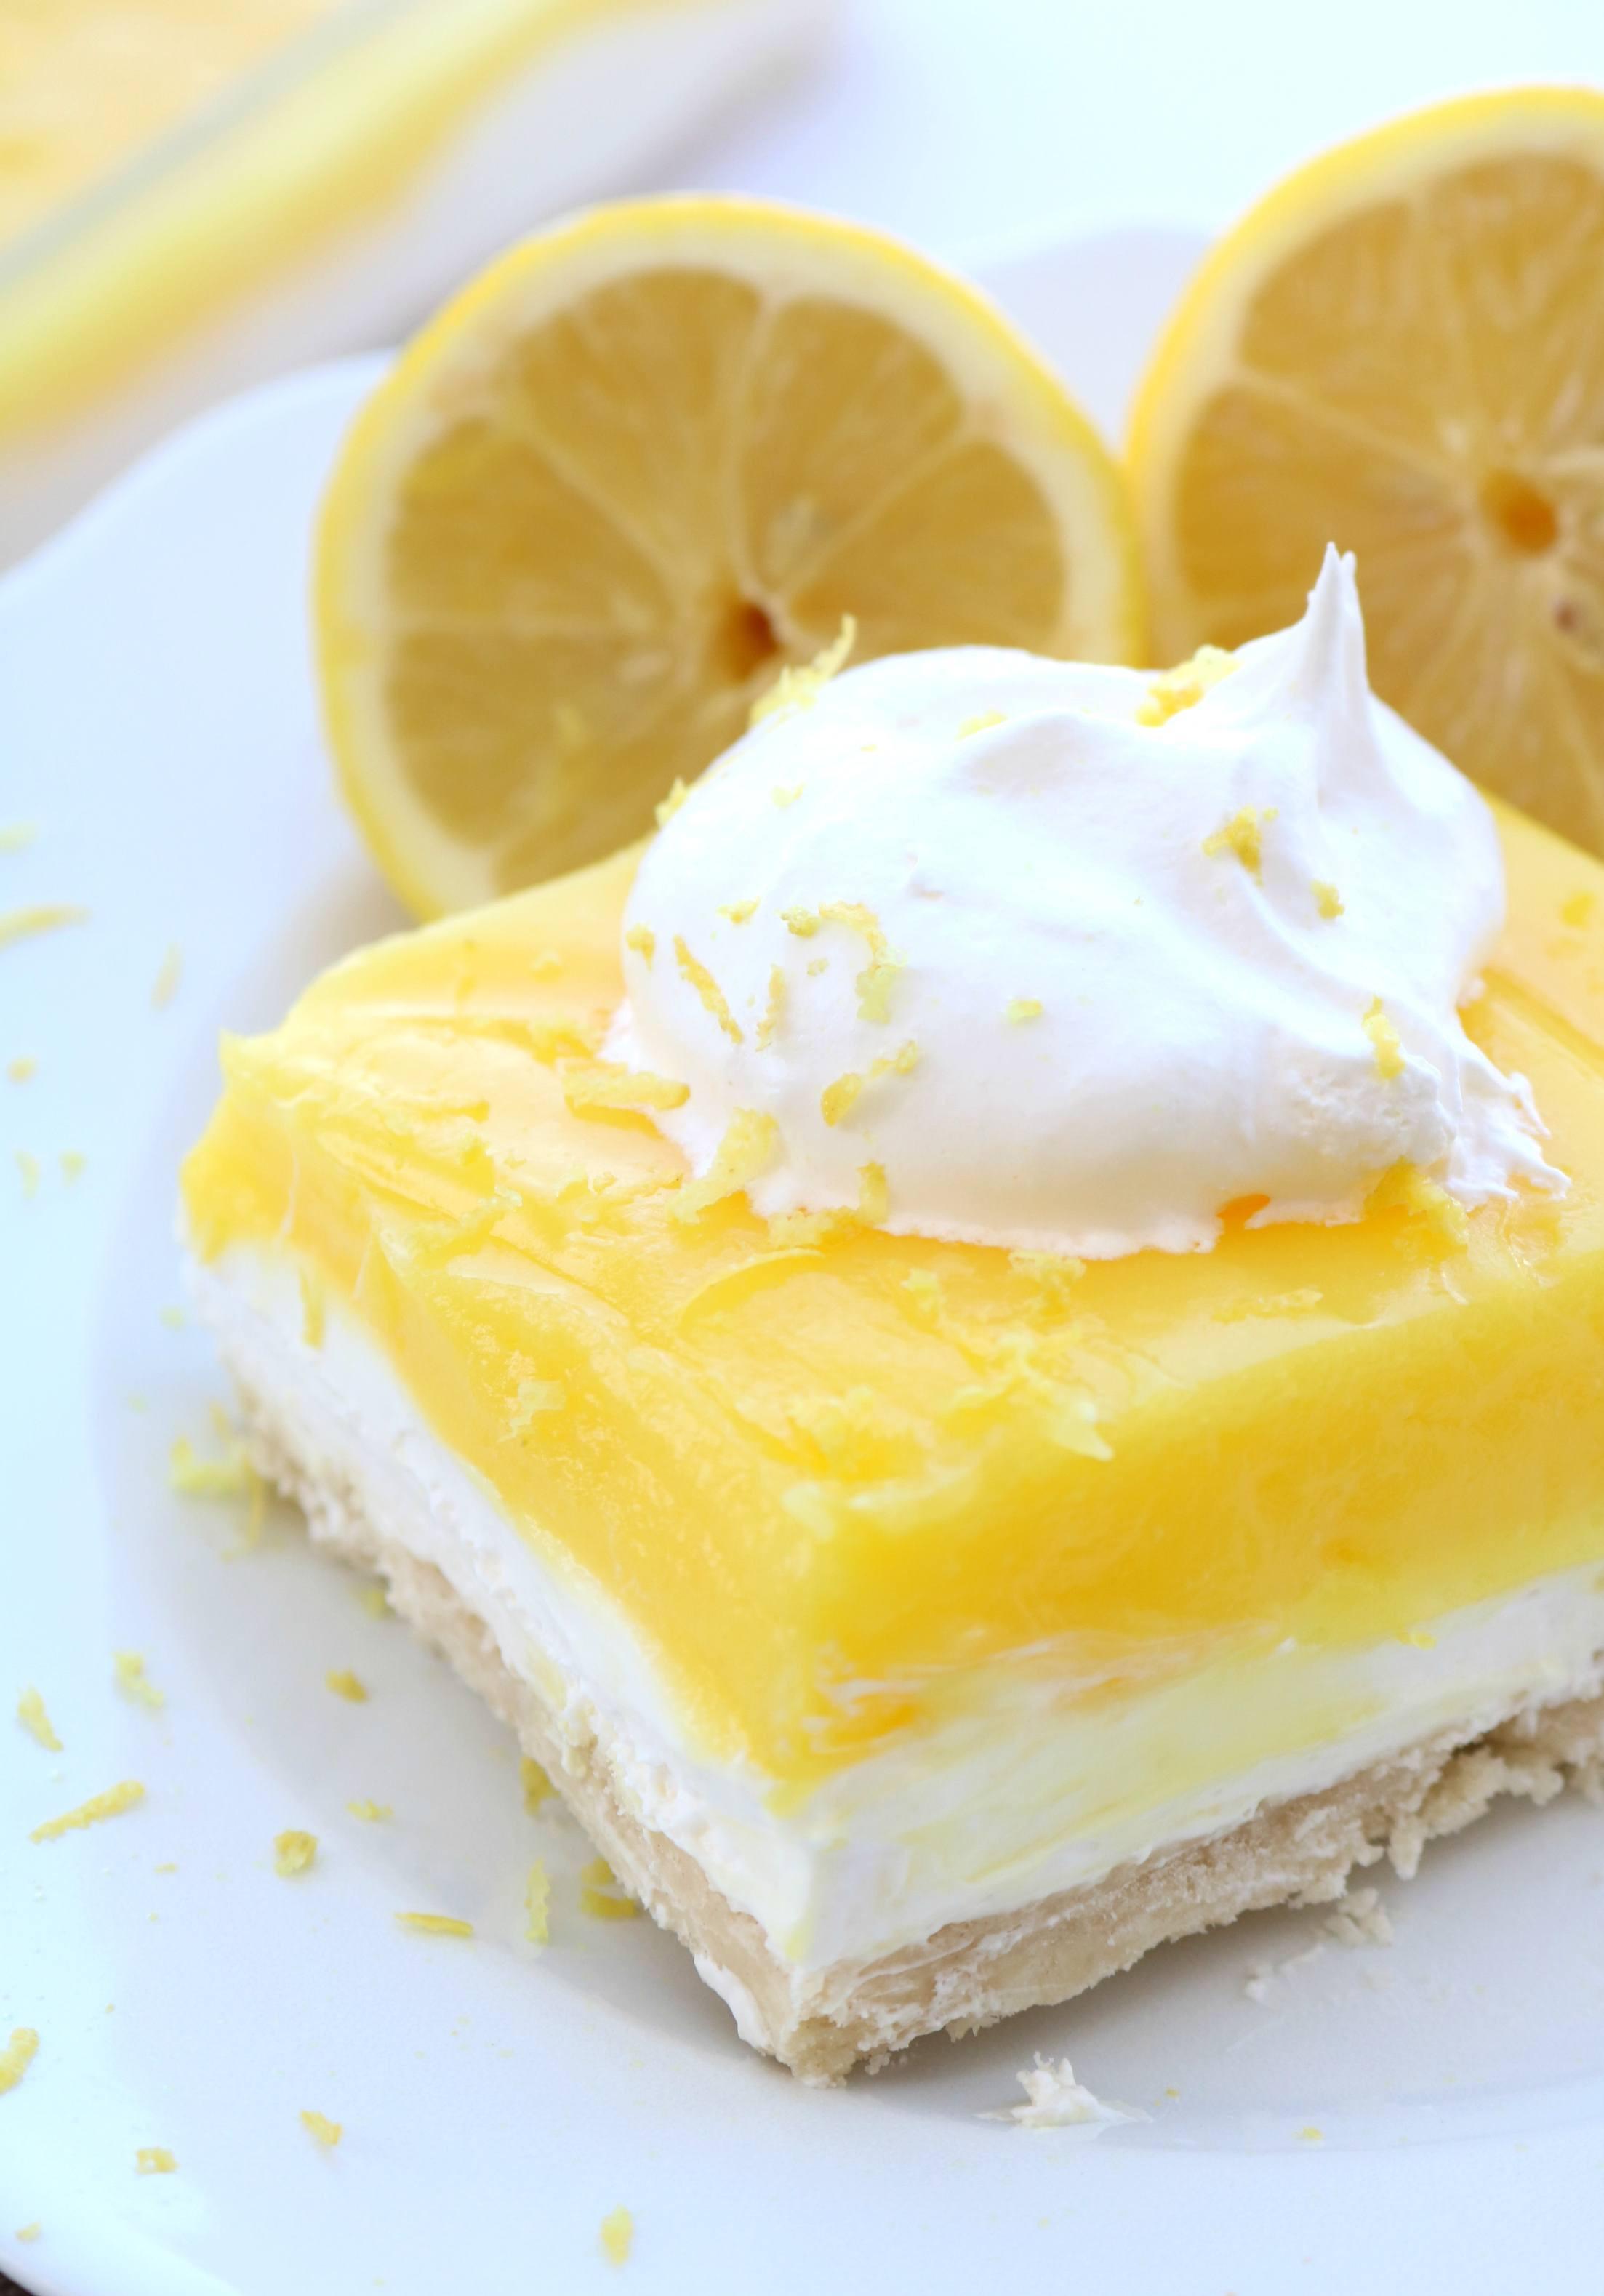 Desserts With Lemon  Layered Lemon Dessert Sugar n Spice Gals